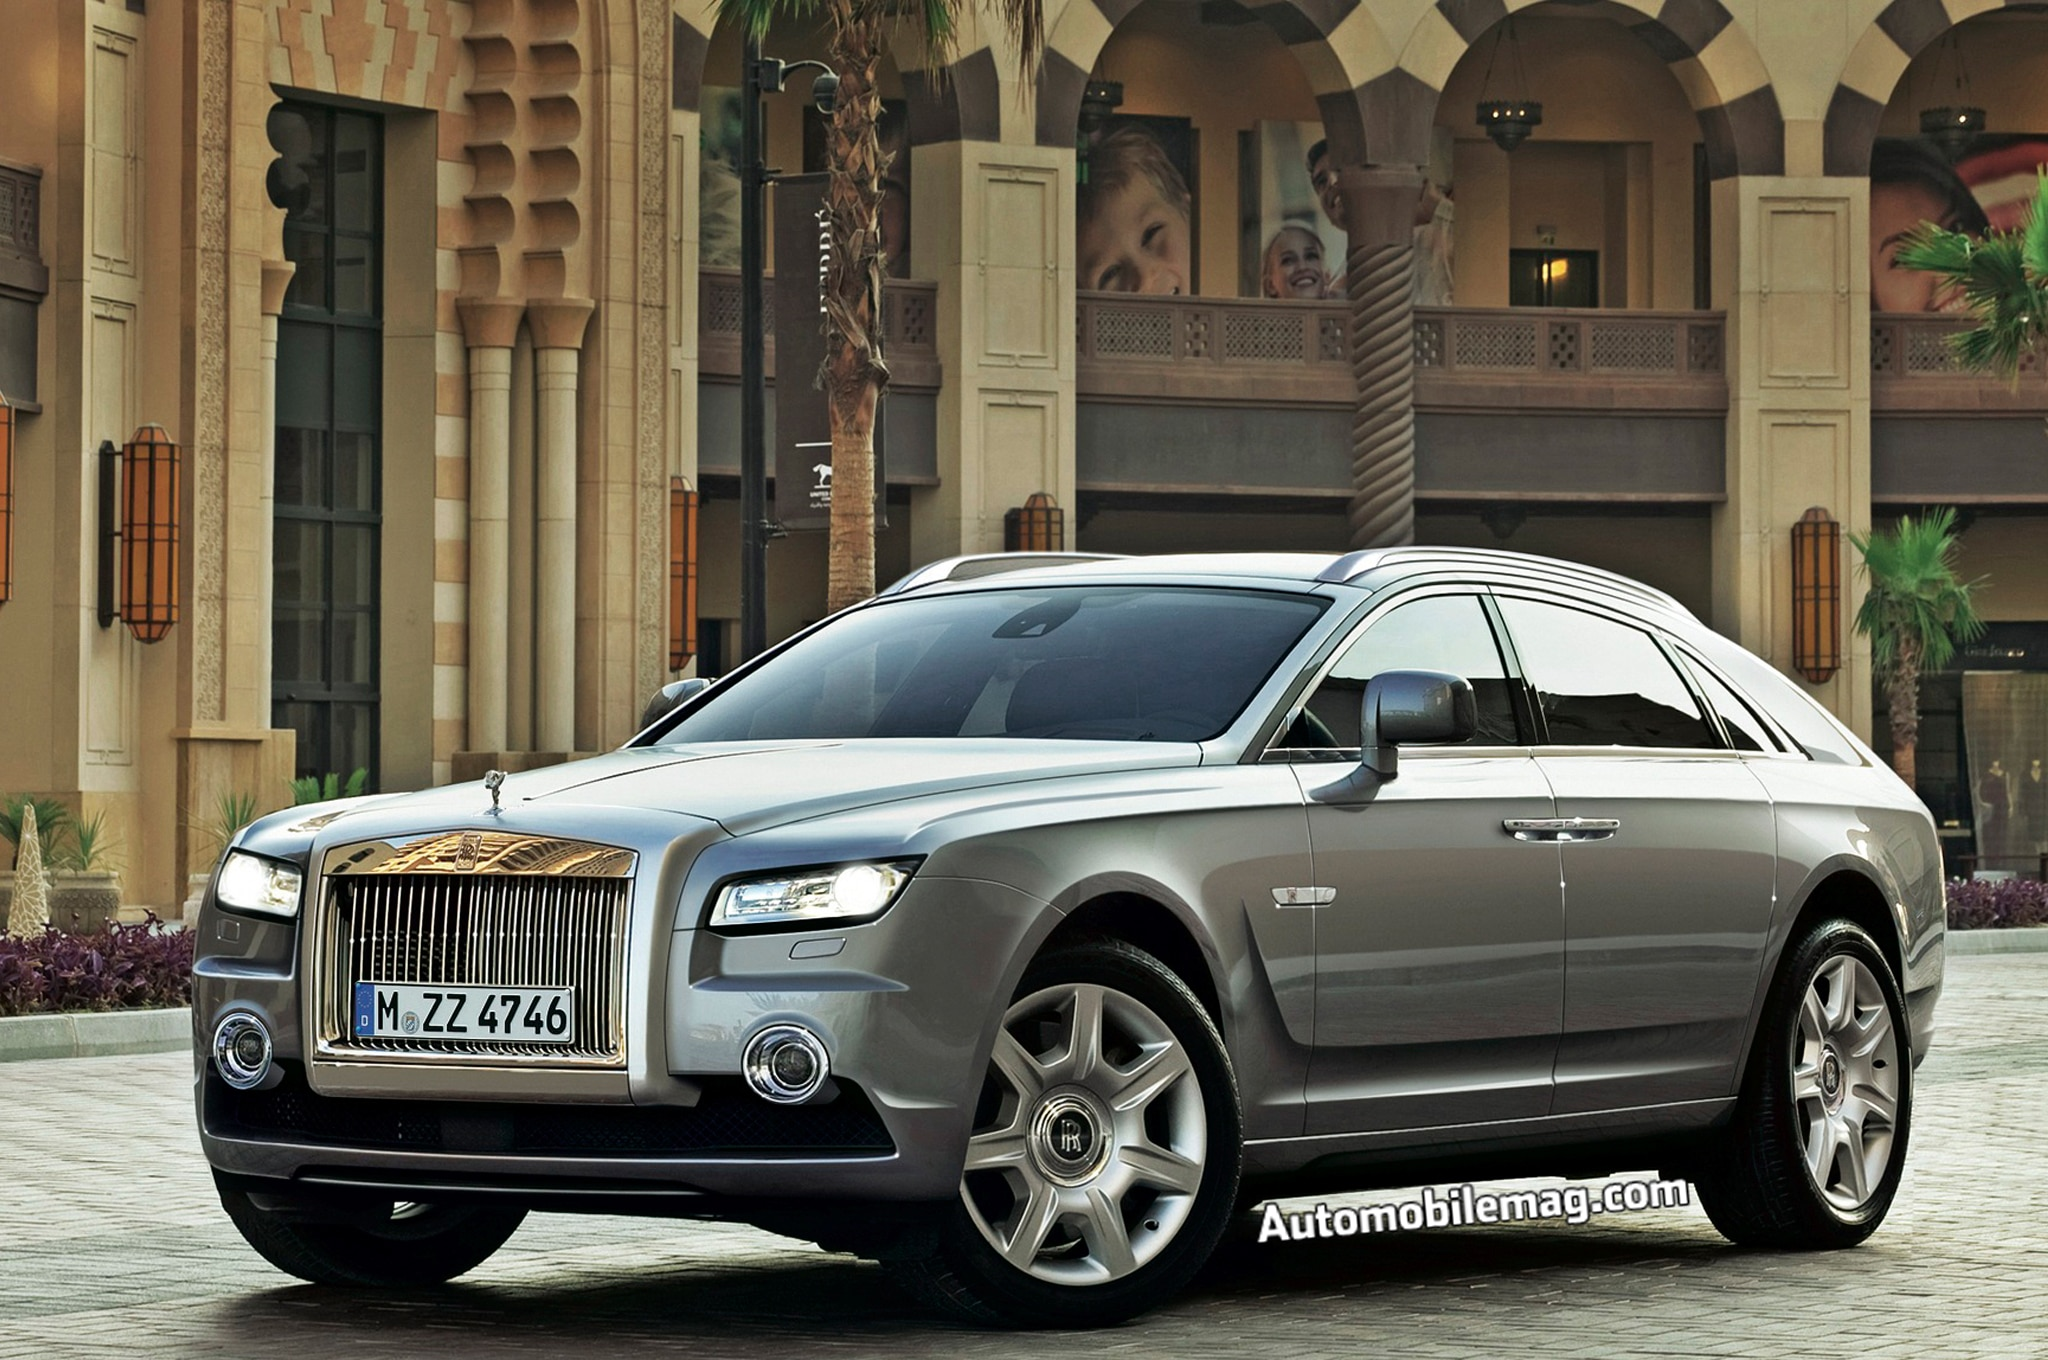 2018 Rolls Royce Pullman Front Three Quarter Rendering1